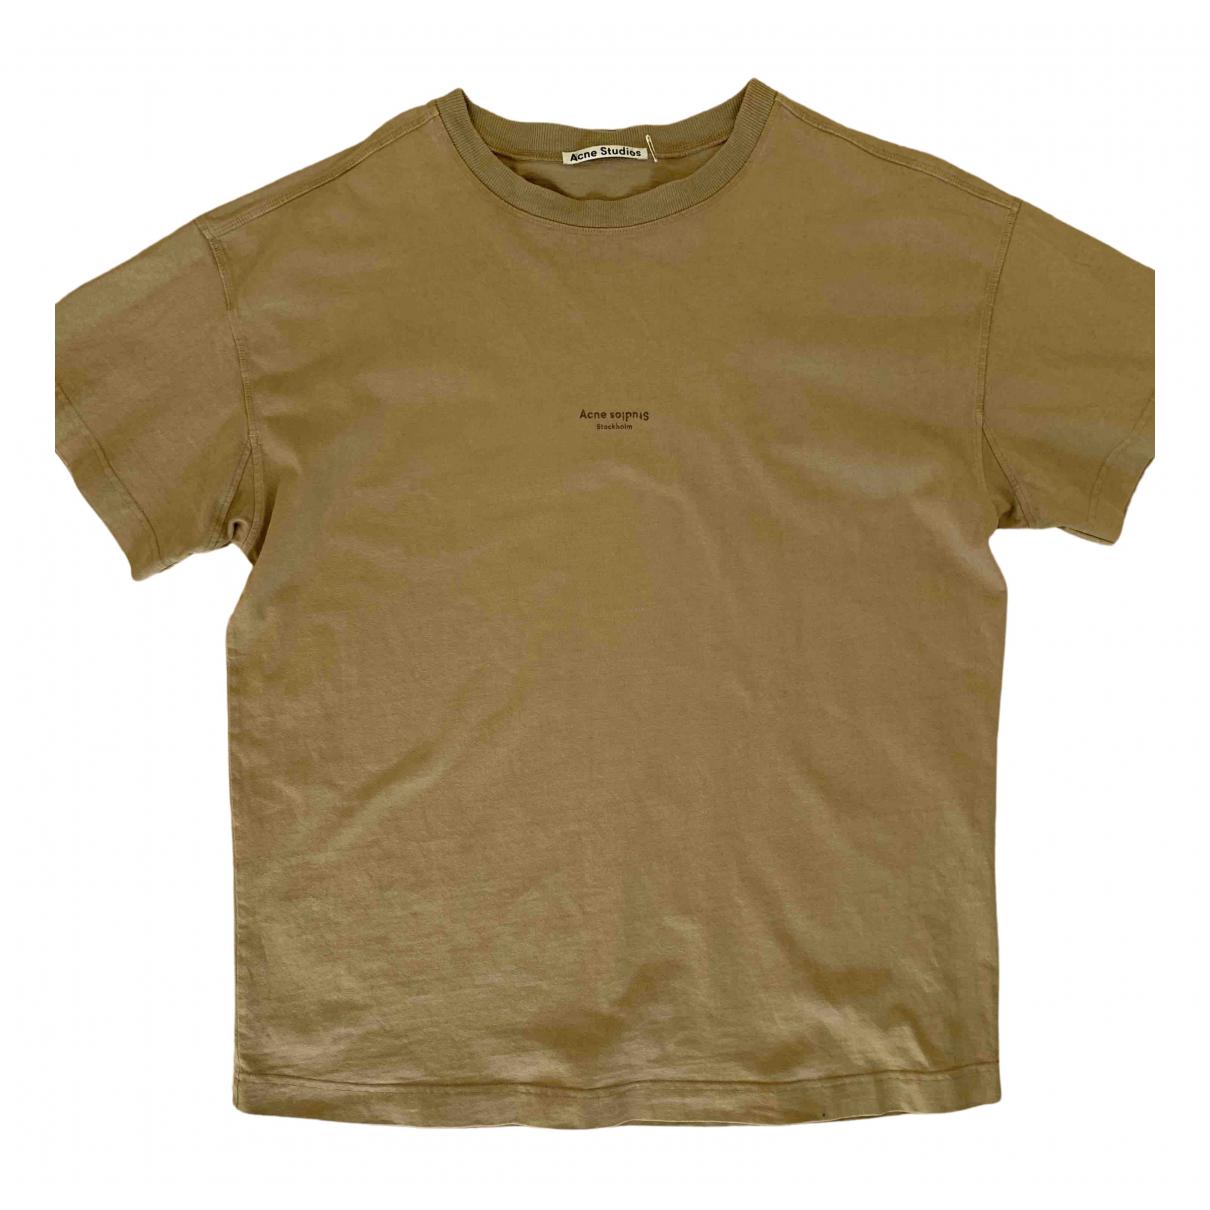 Acne Studios \N Beige Cotton T-shirts for Men L International